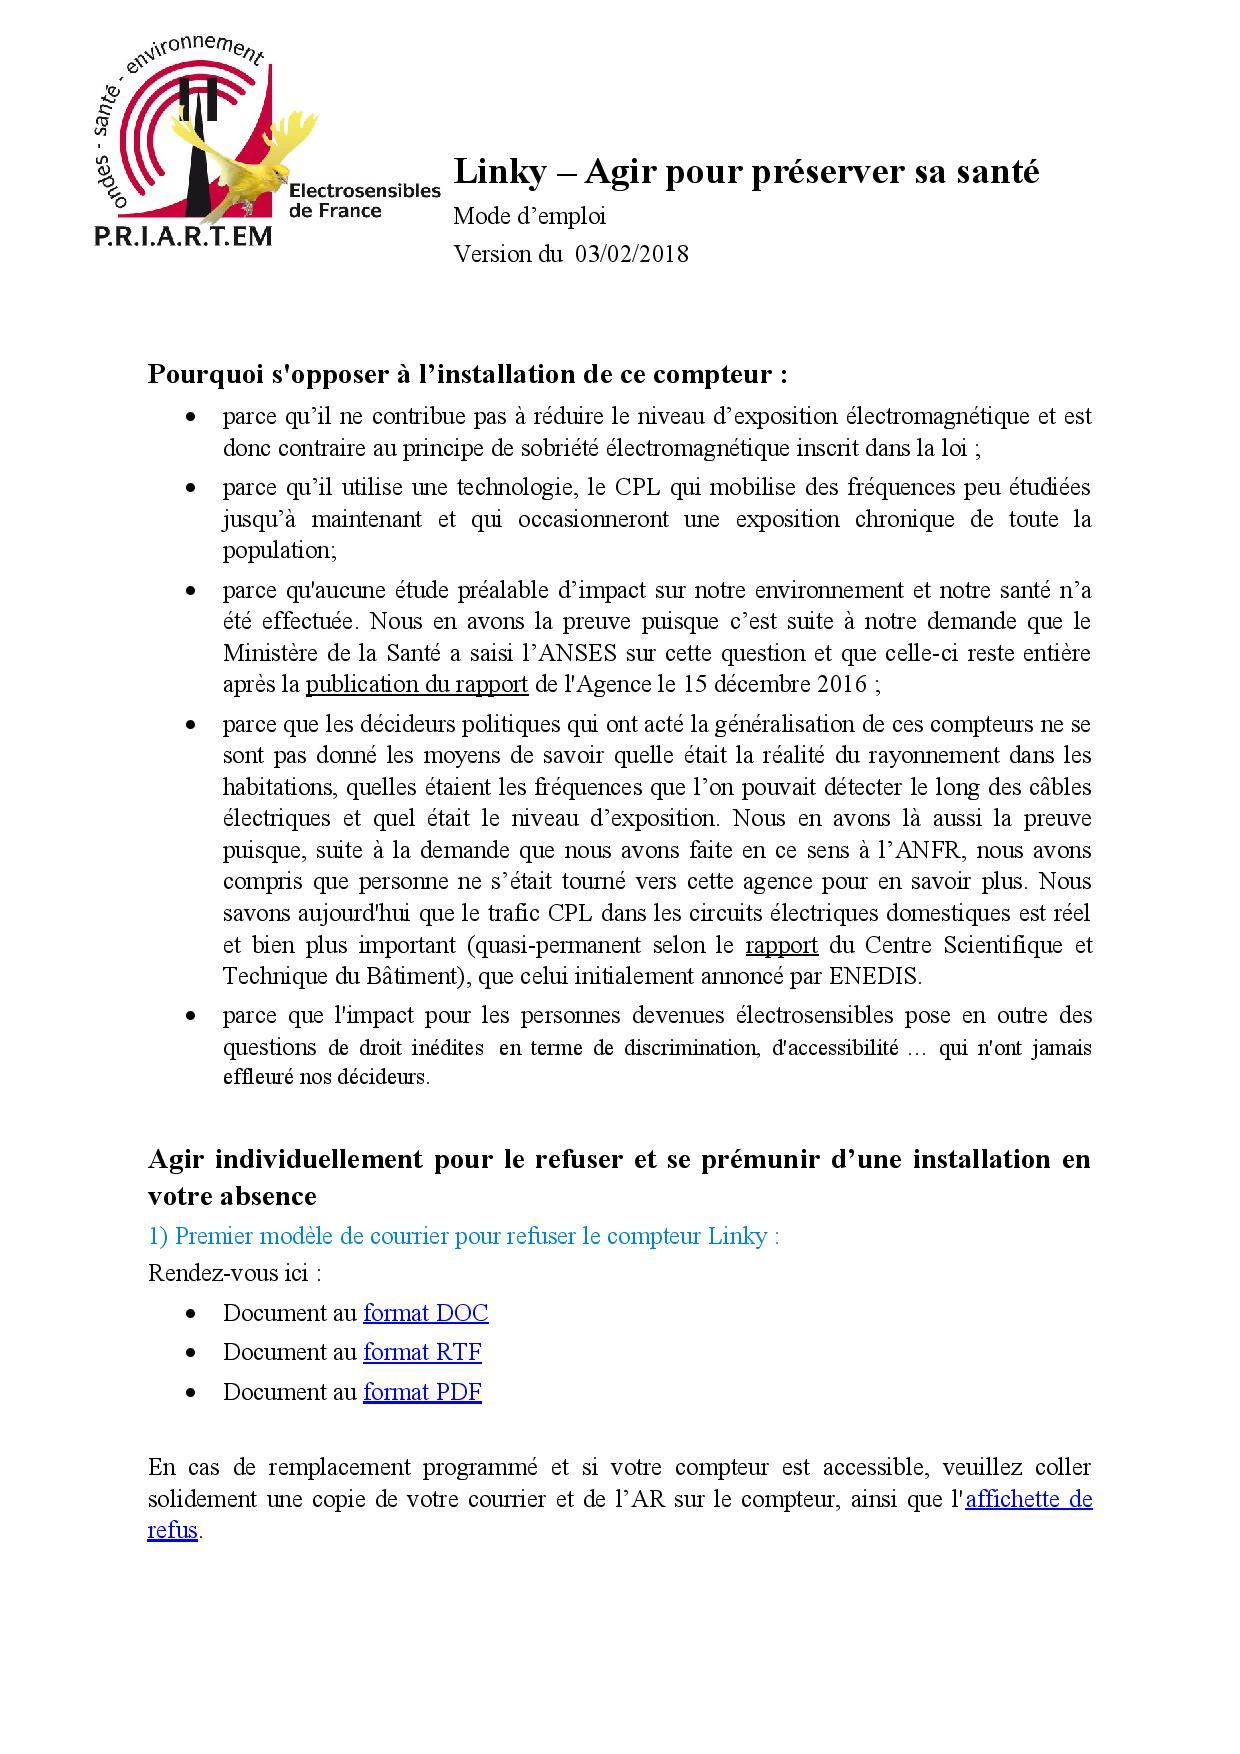 18-2 Priartem linky_-_agir-page-001.jpg